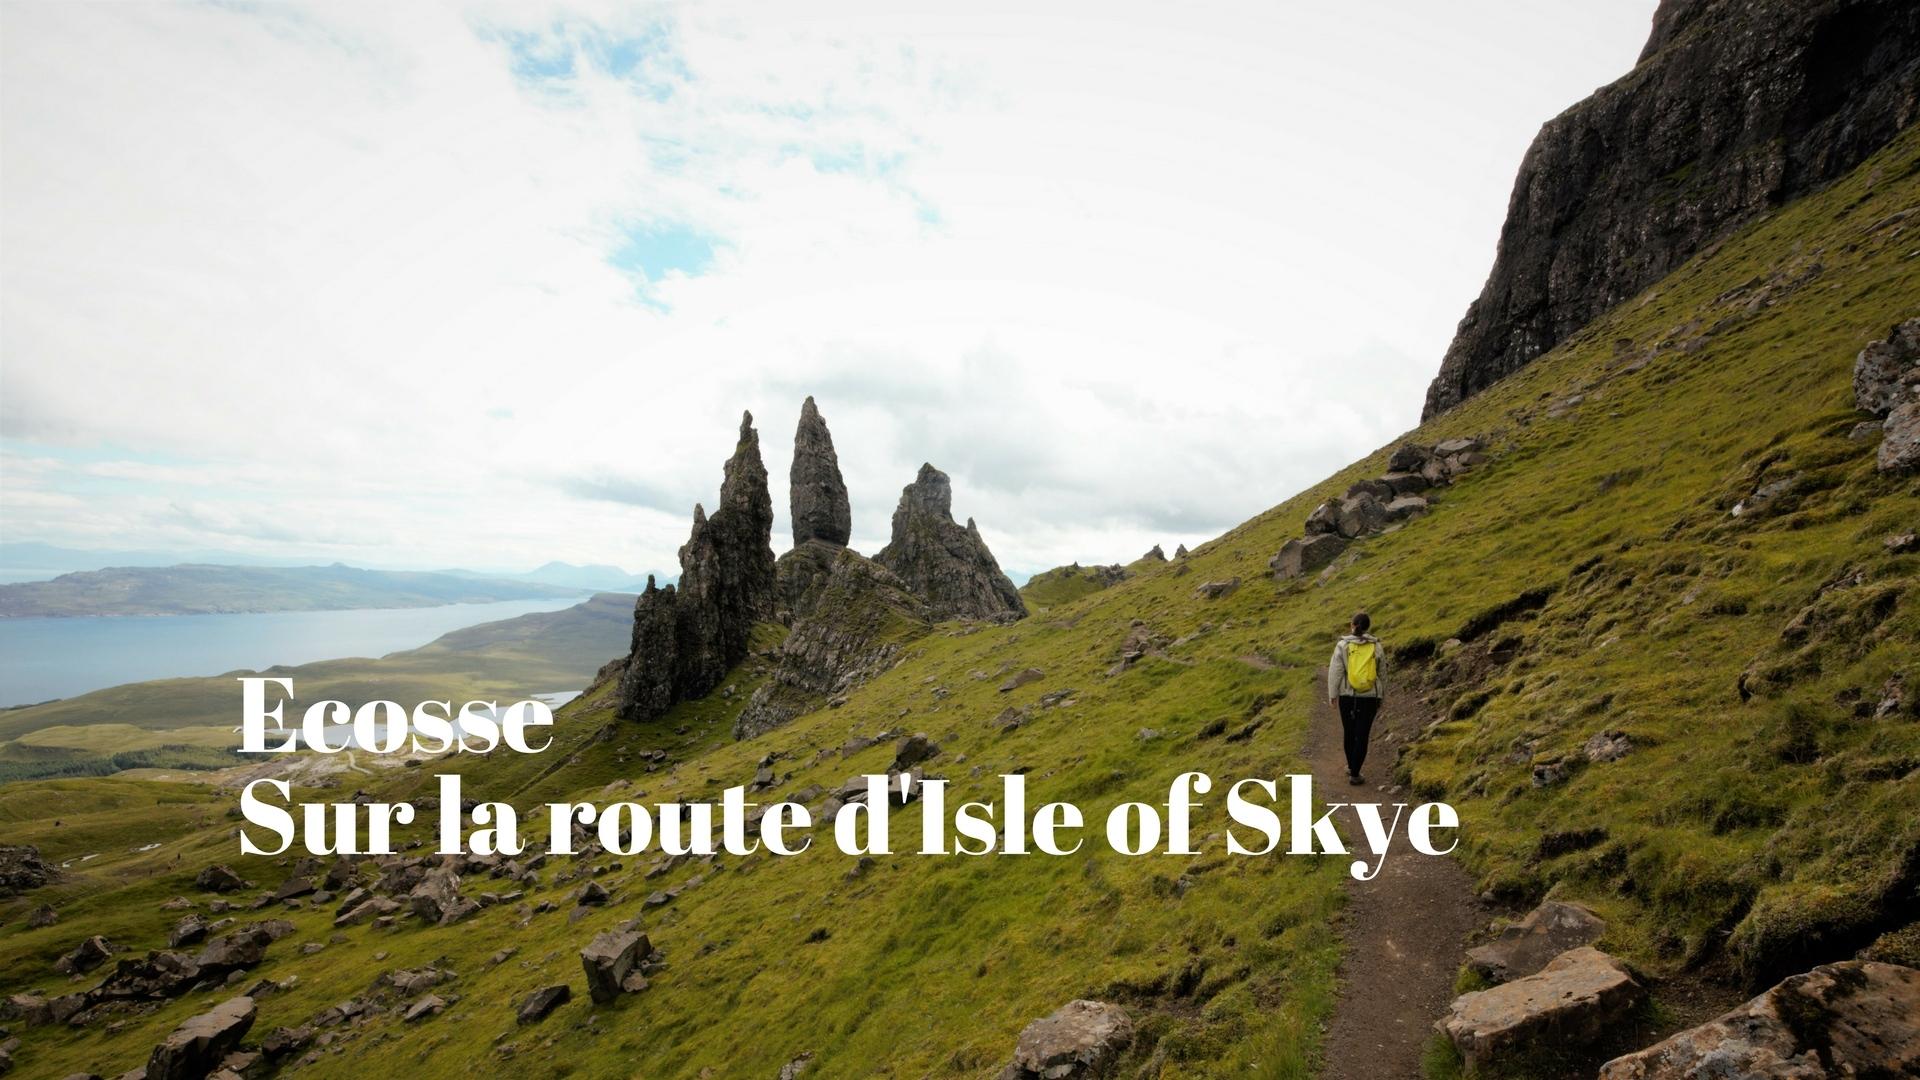 Voyage en Ecosse : direction Isle of Skye